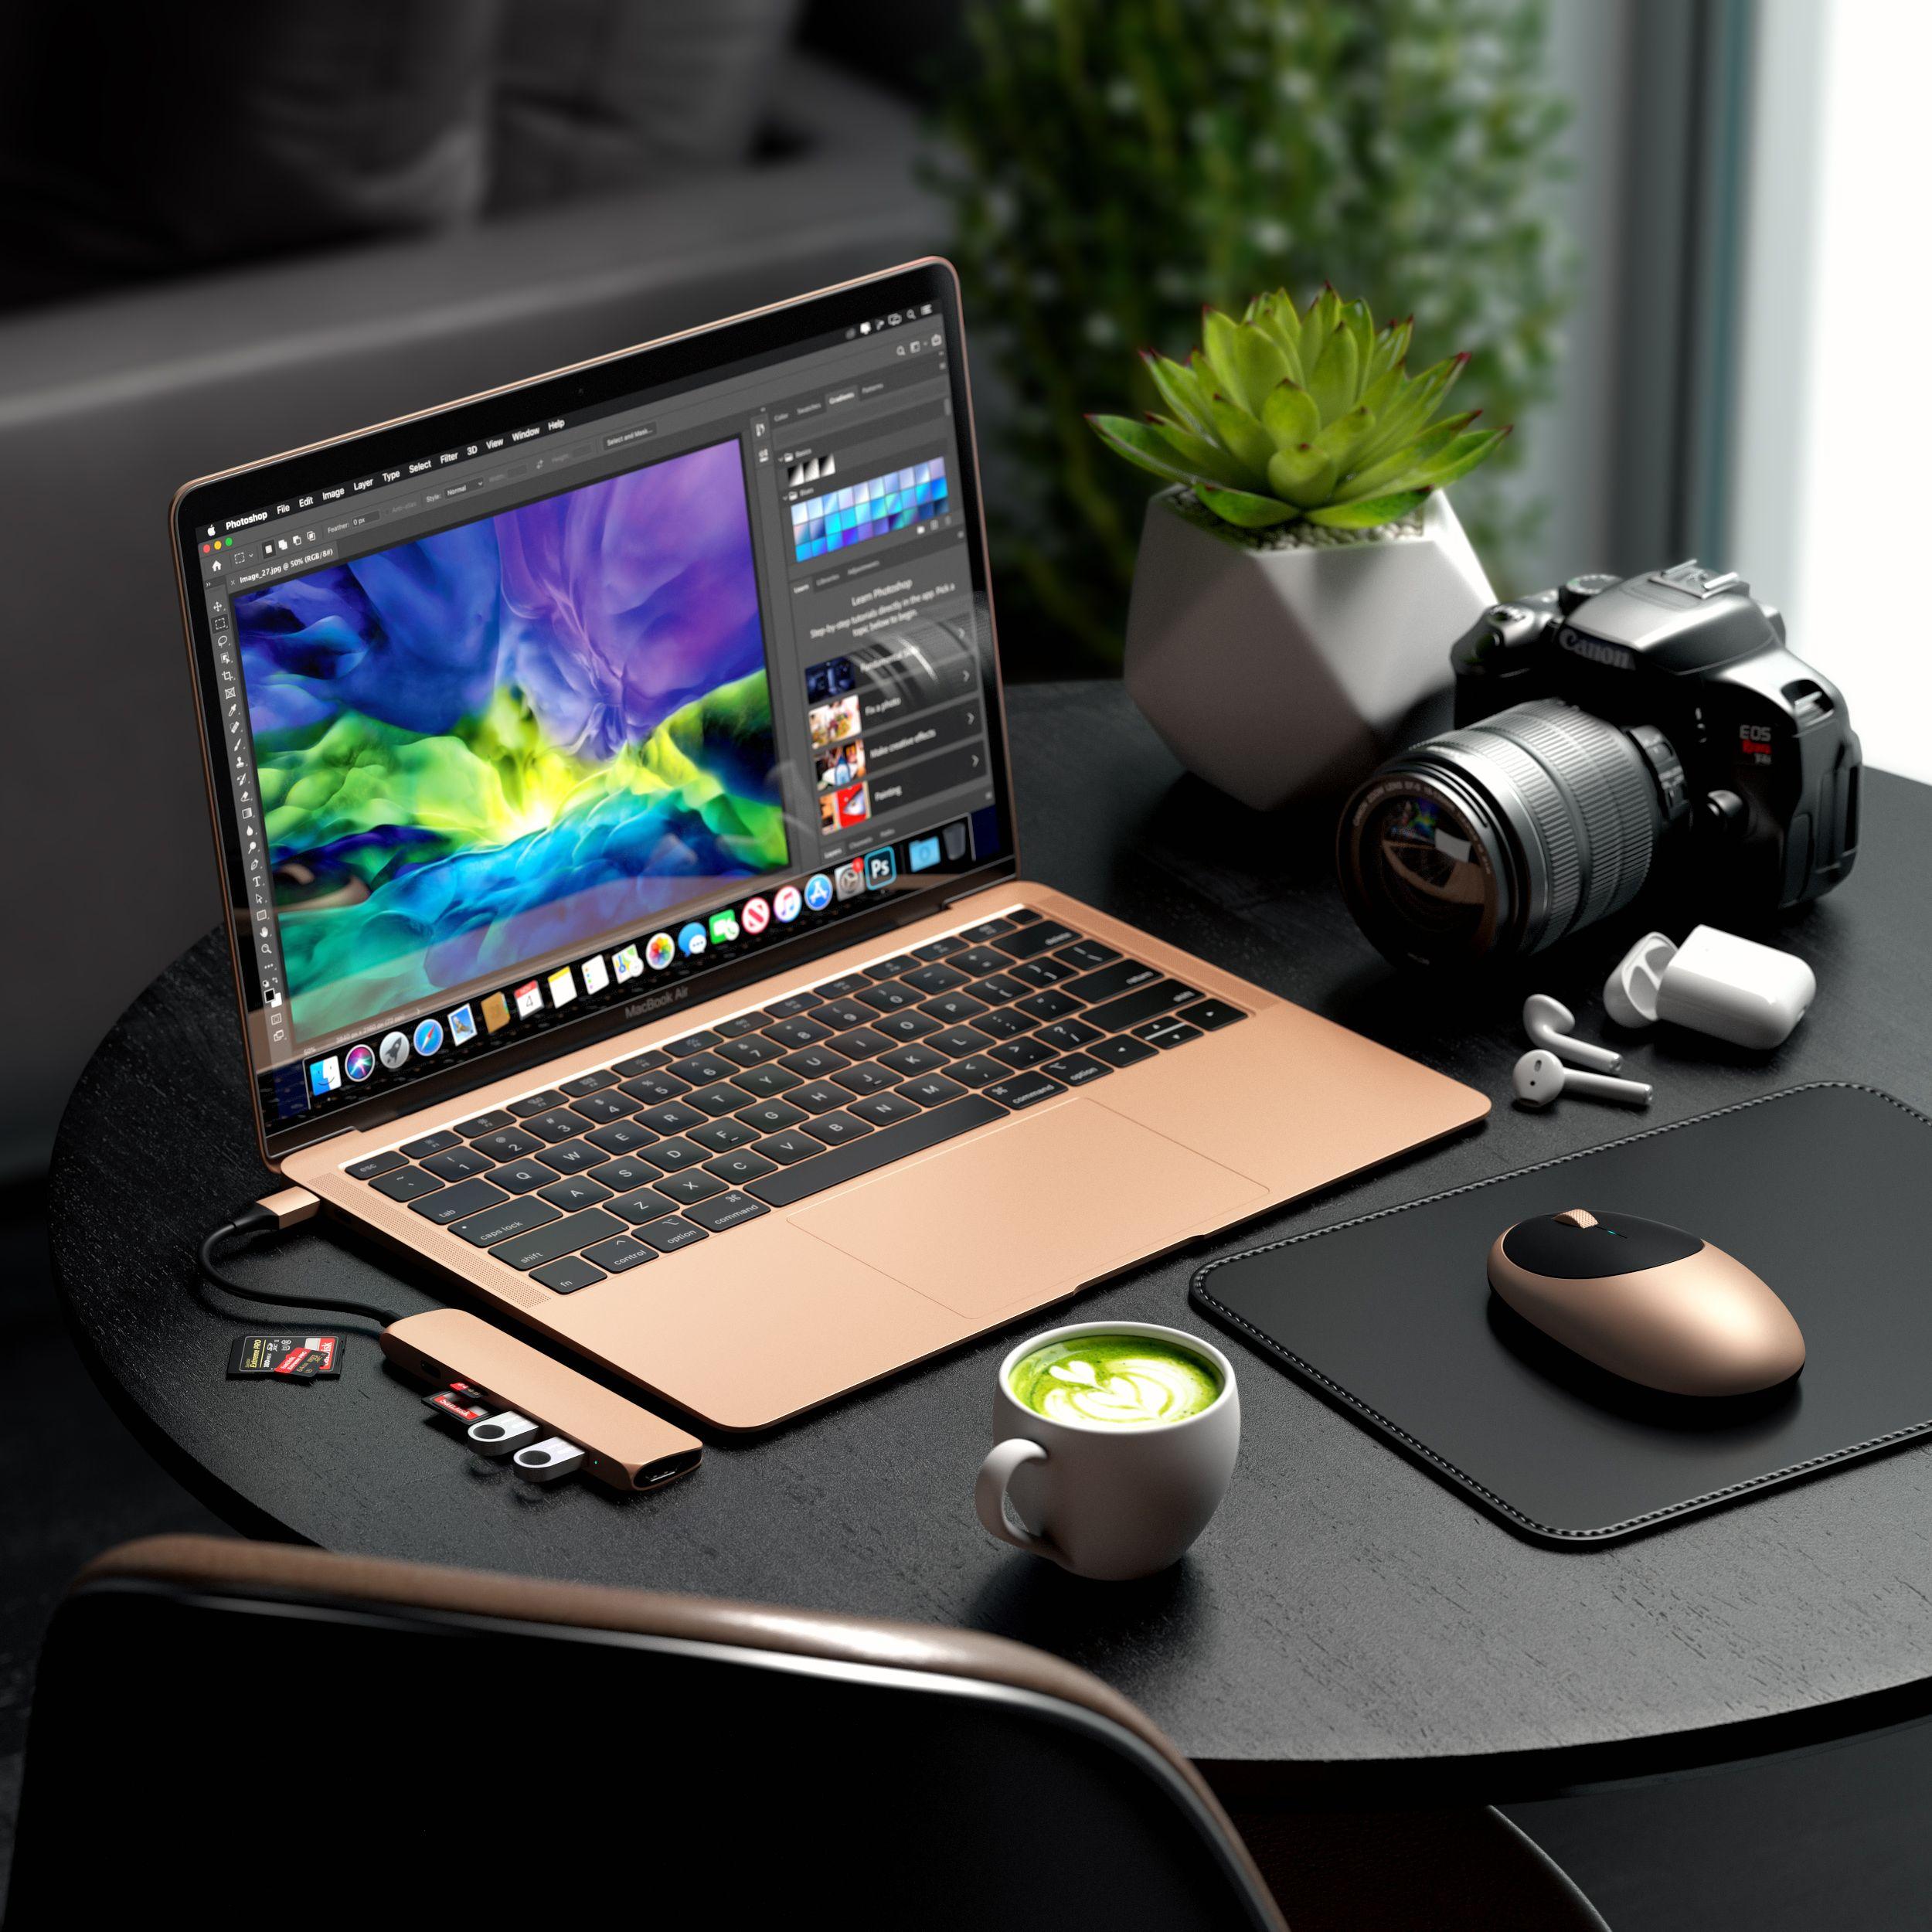 Accessories To Match Your Gold Macbook Air In 2020 Macbook Air Macbook Ipad Pro